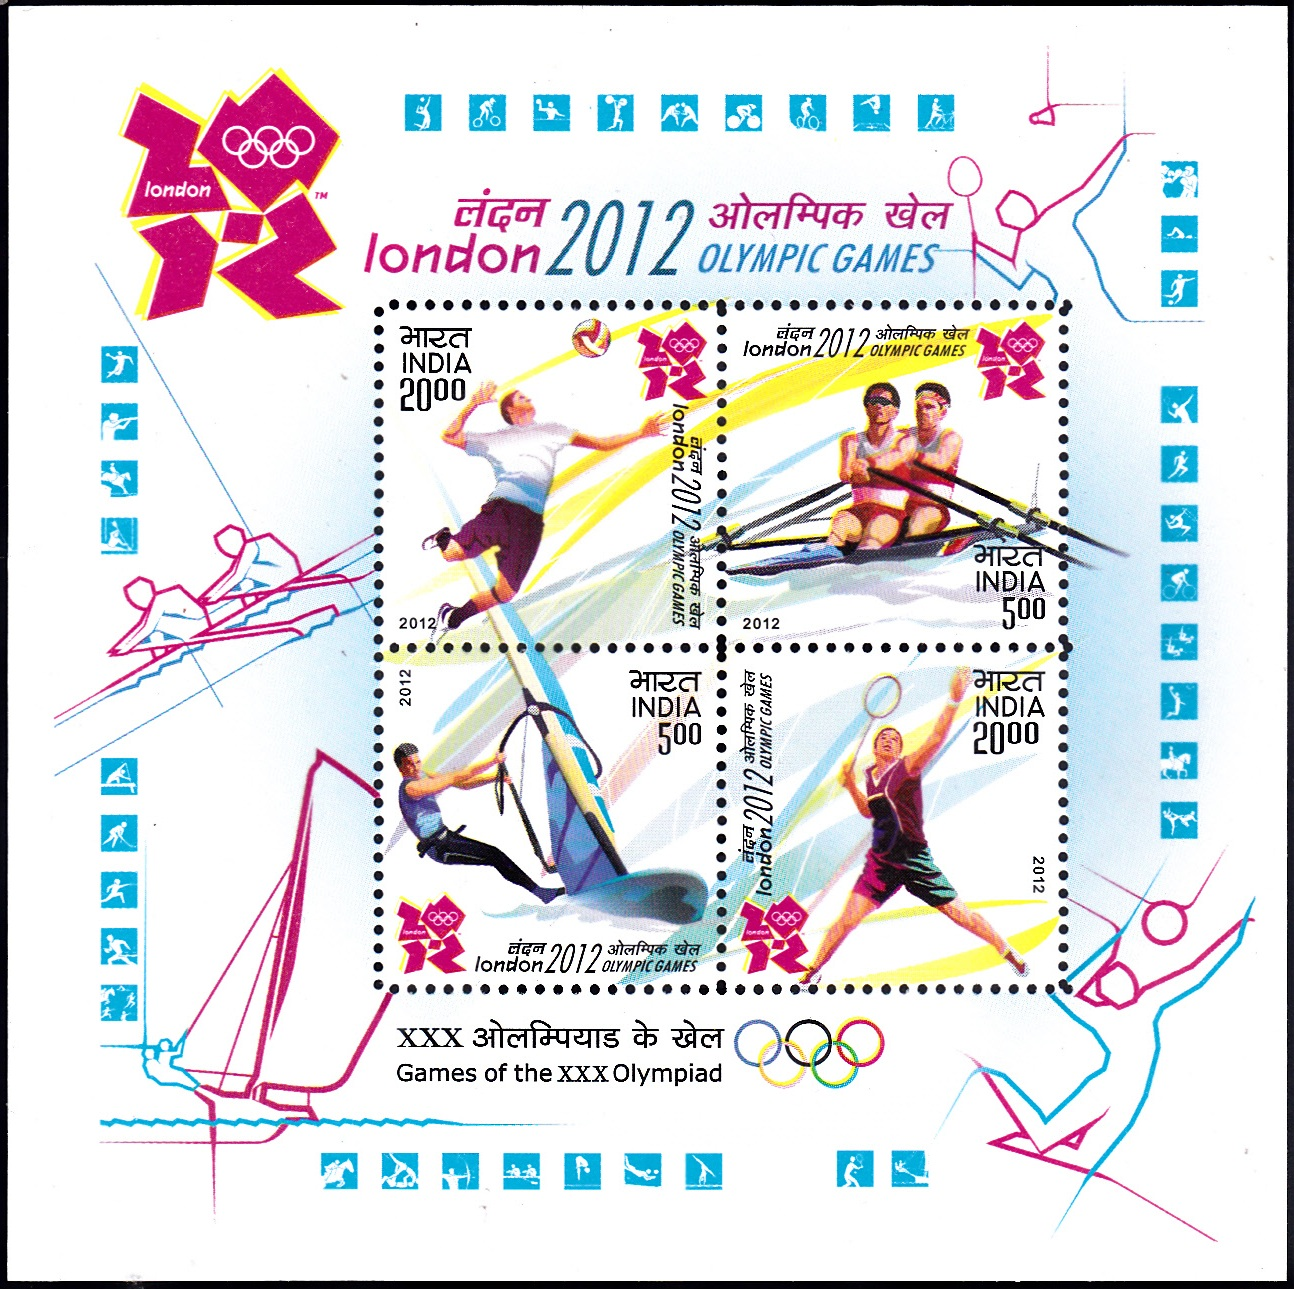 The London 2012 Summer Olympics